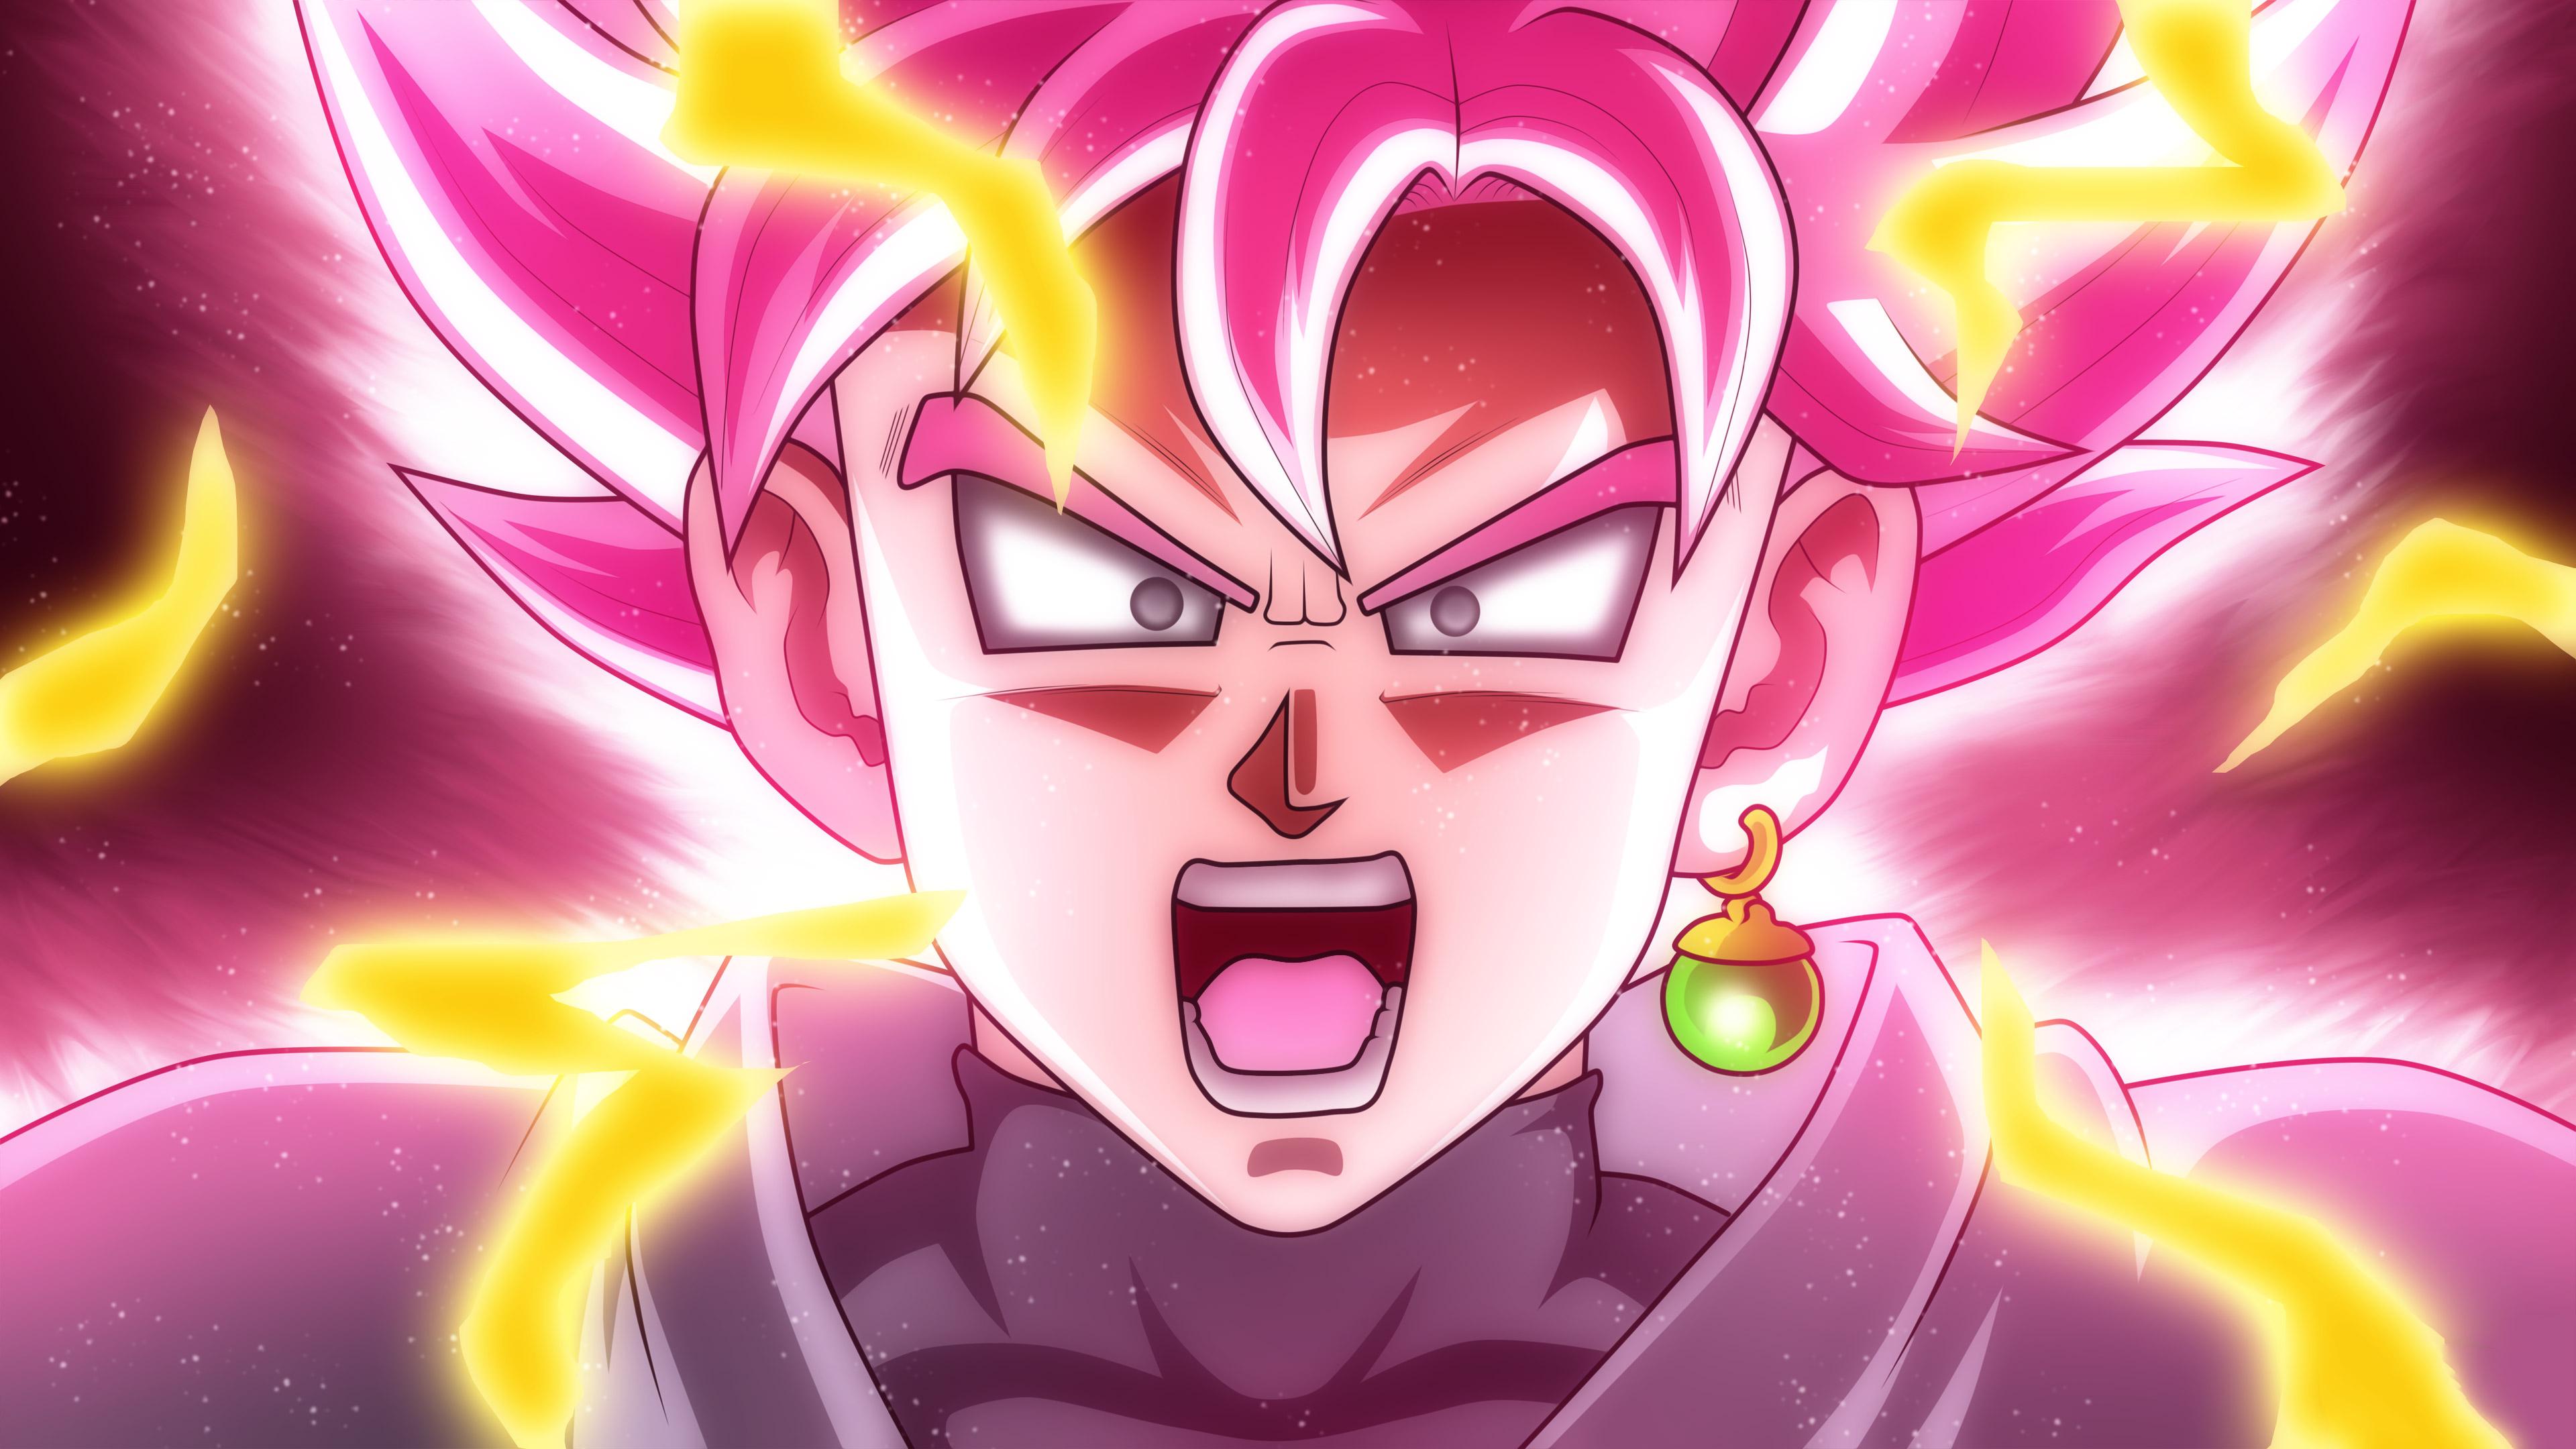 goku 1541973590 - Goku - hd-wallpapers, anime wallpapers, 4k-wallpapers